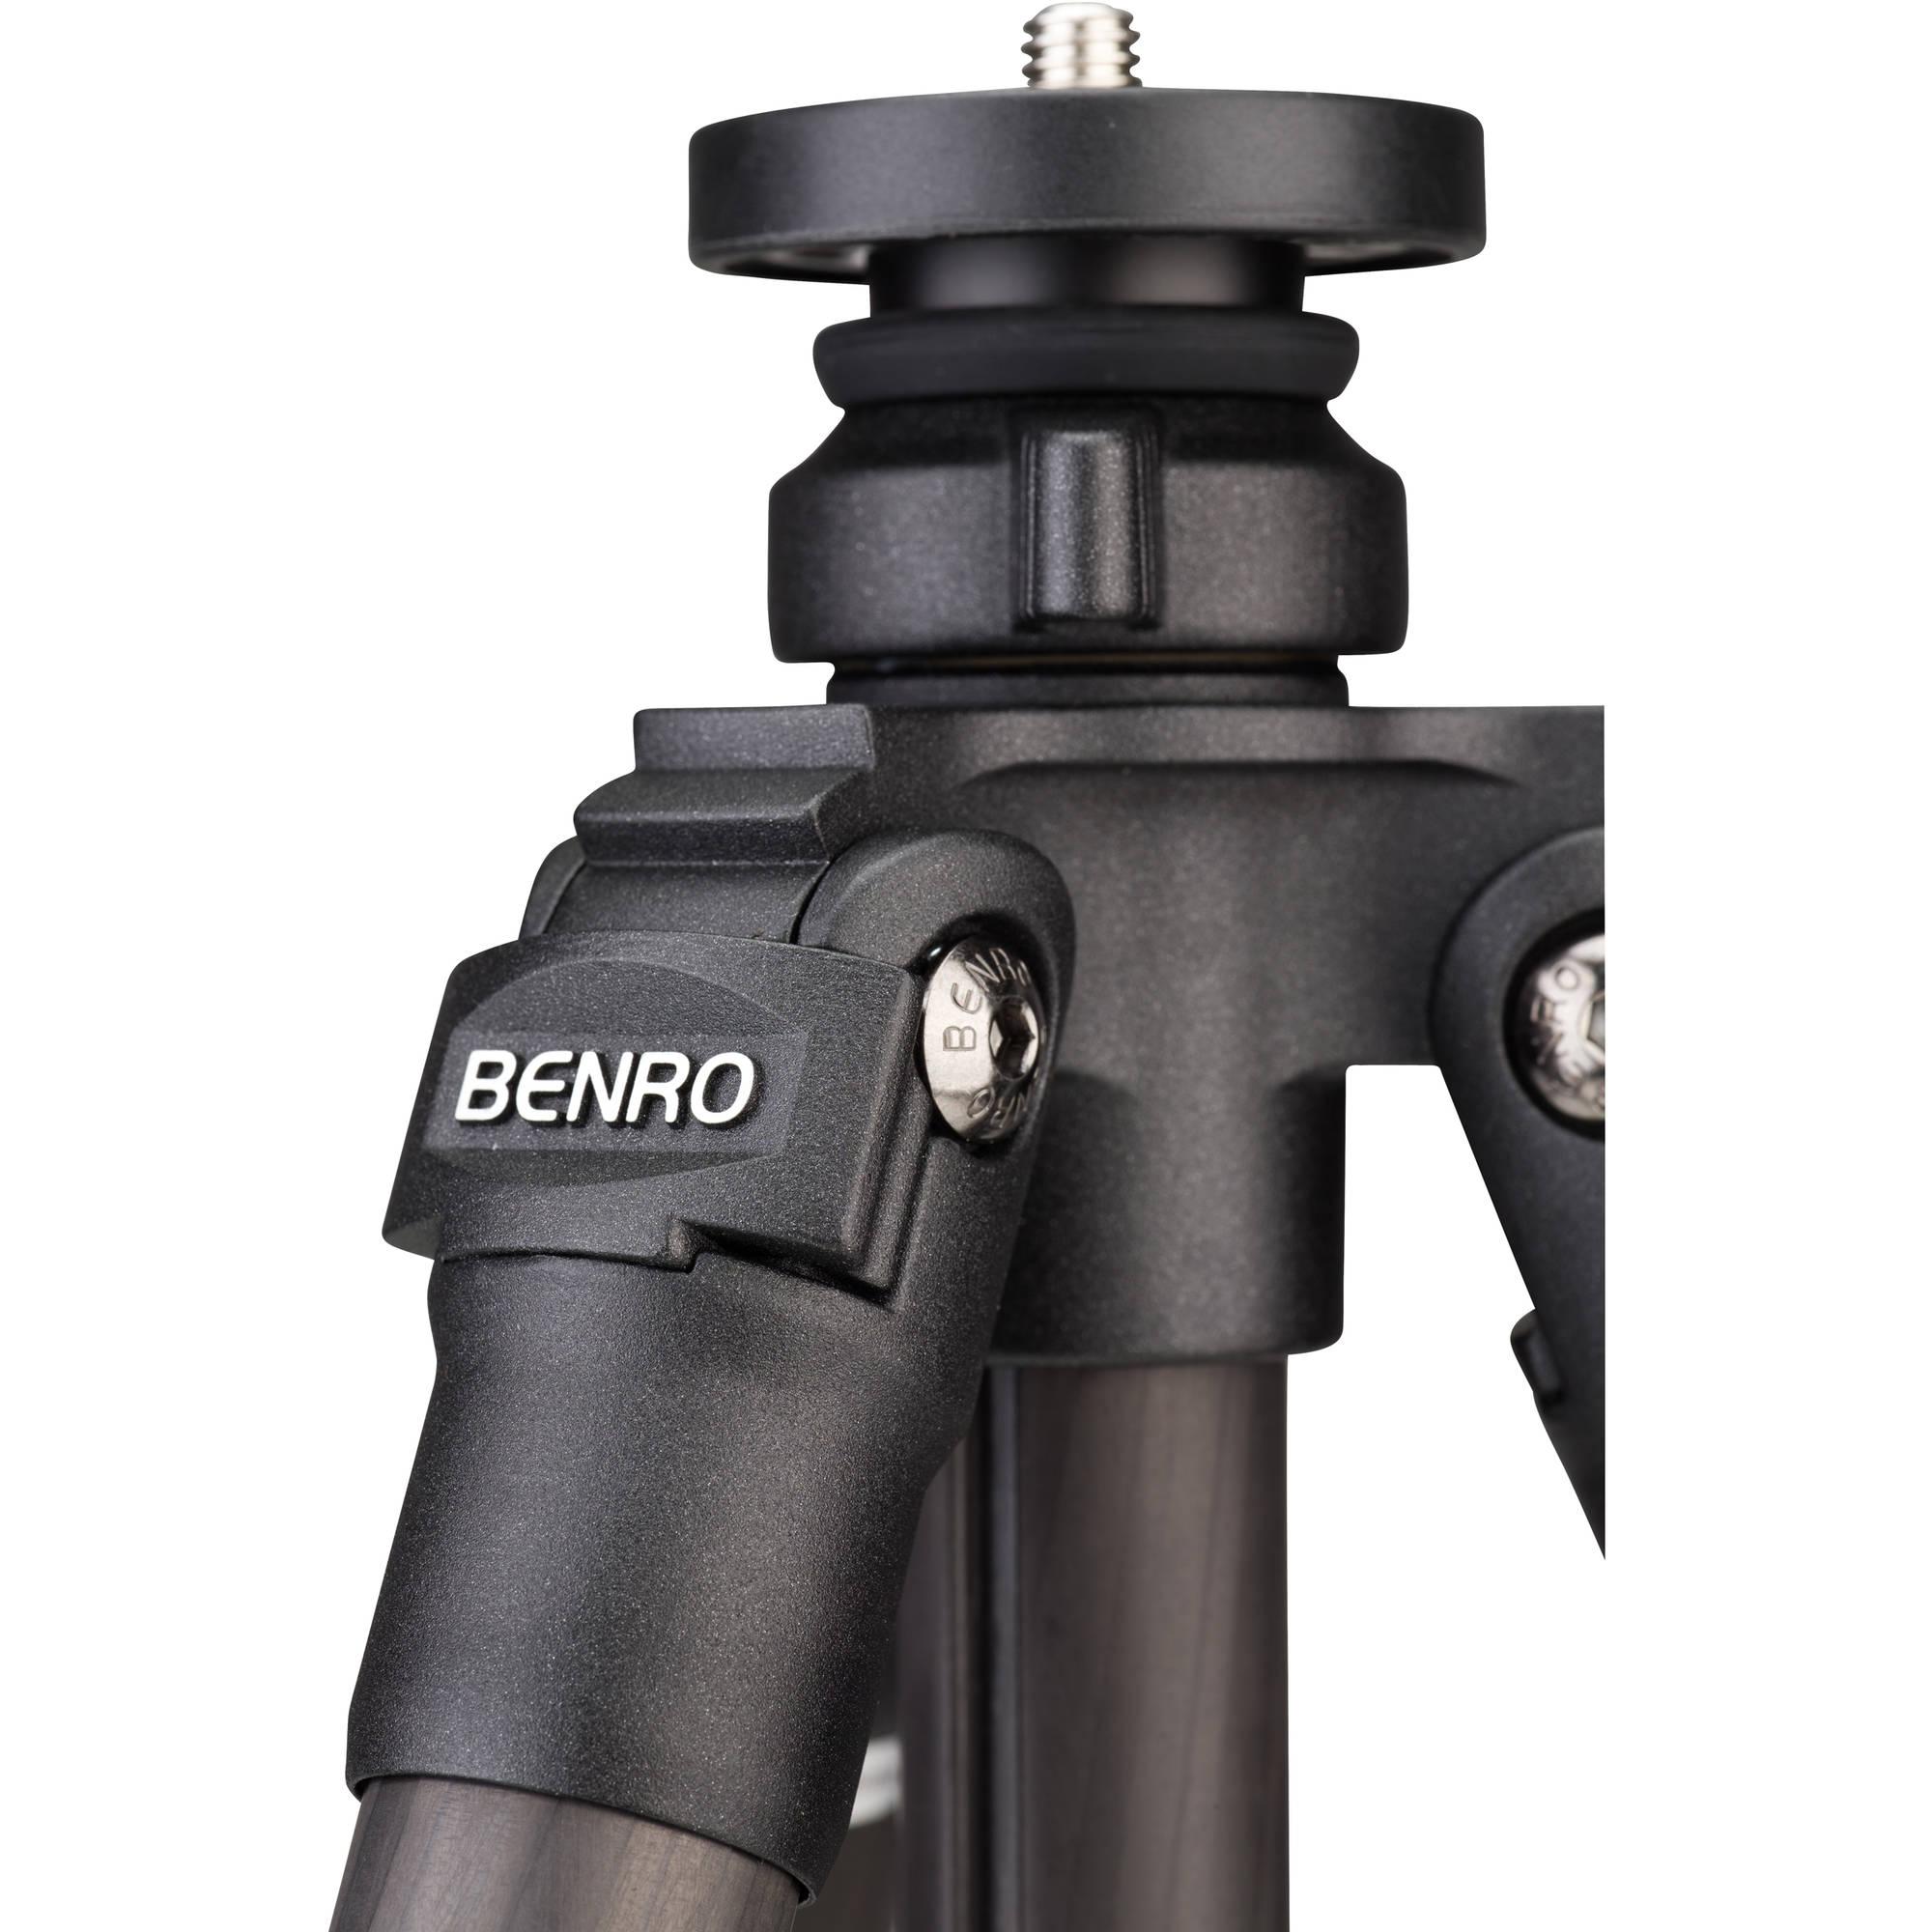 Benro Adventure 3 Series Carbon Fiber Tripod TAD37C